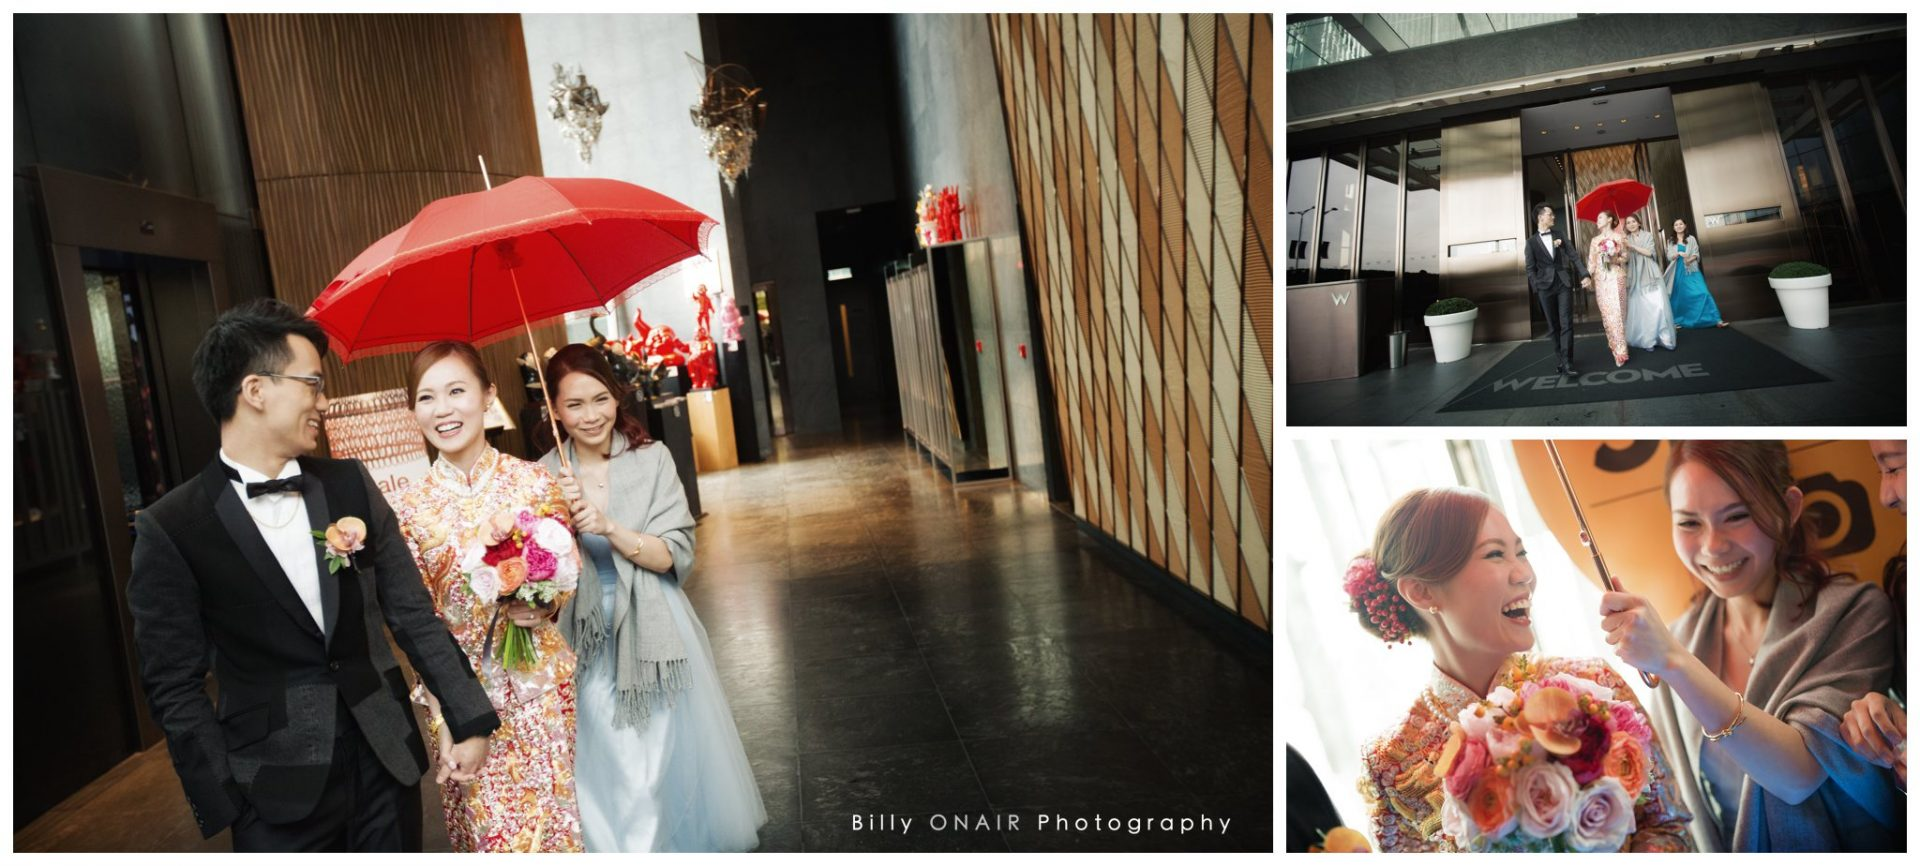 billy_wedding_photography_013